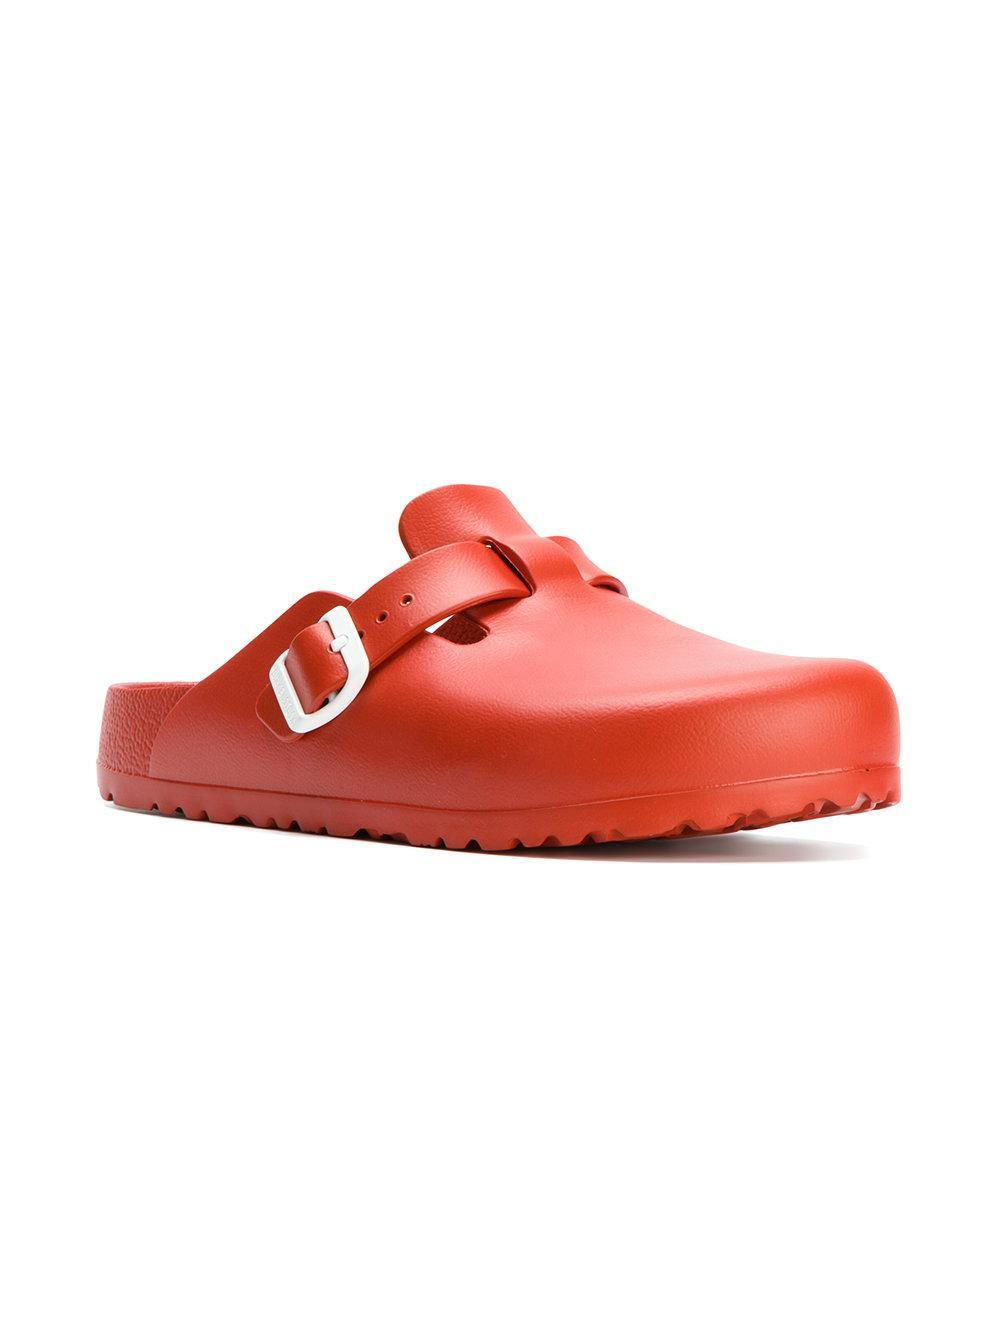 Dansko Shoes Boston